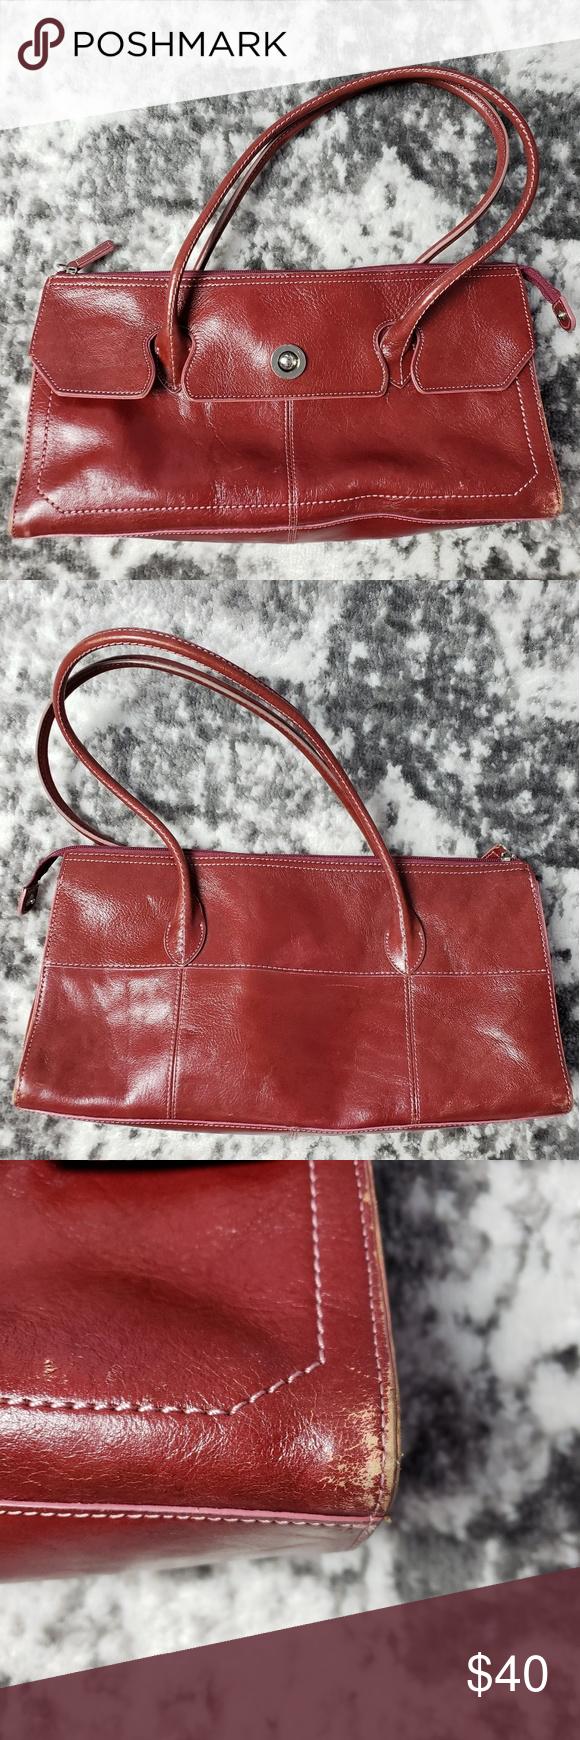 Wilsons Leather Pelle Studio Italian Leather Wilsons